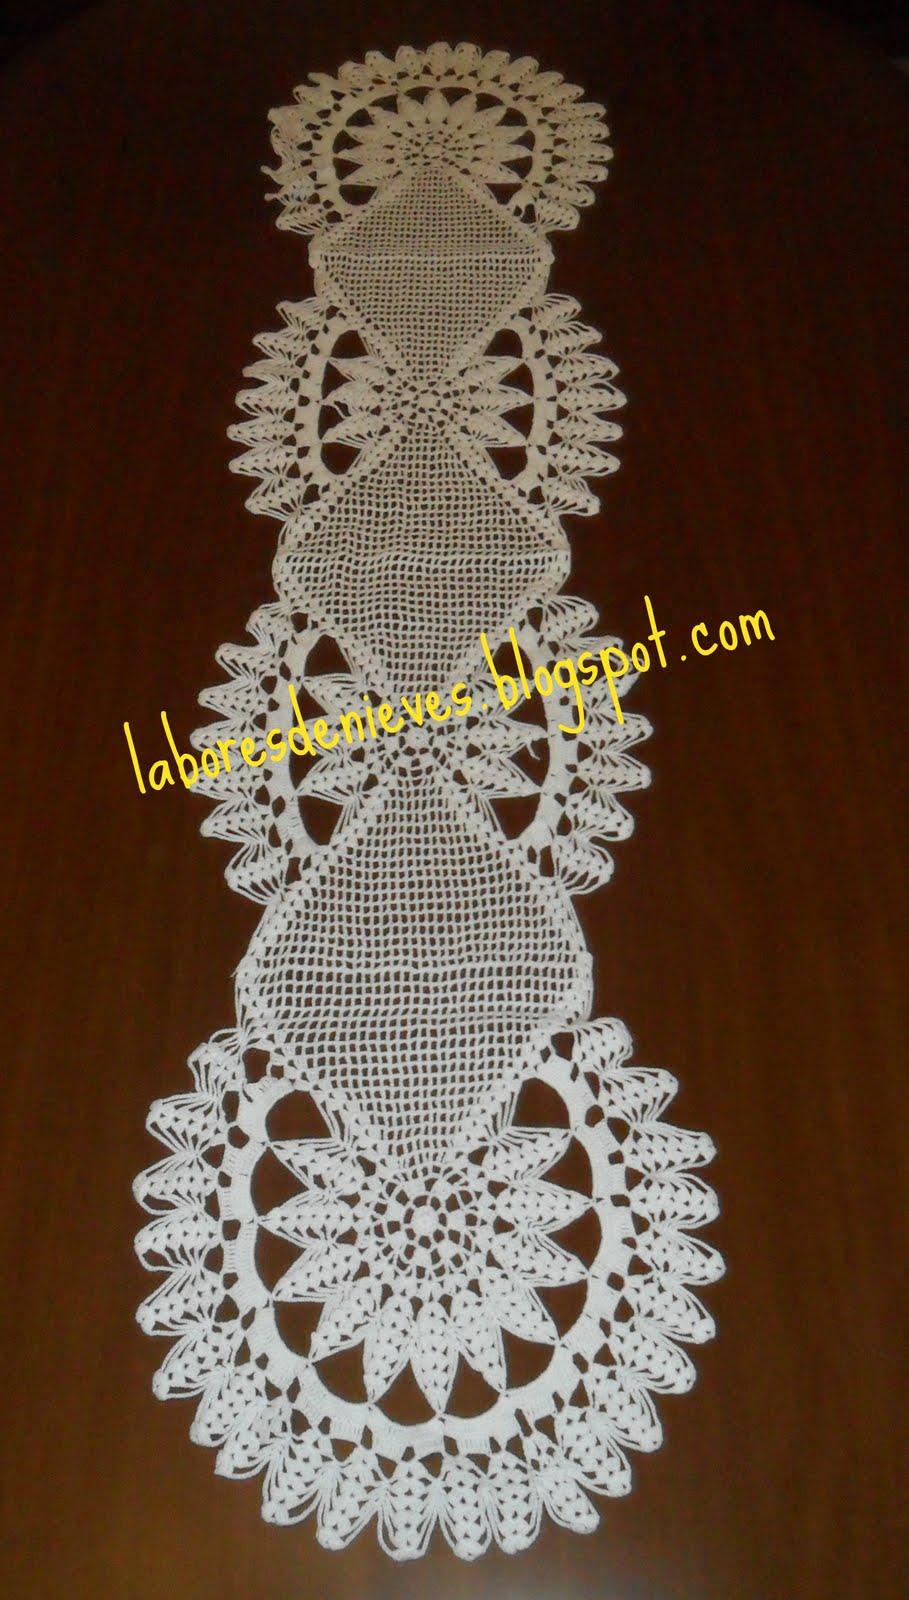 Patrones de tapetes centros de mesas tejidos a crochet - Tapetes para mesa ...